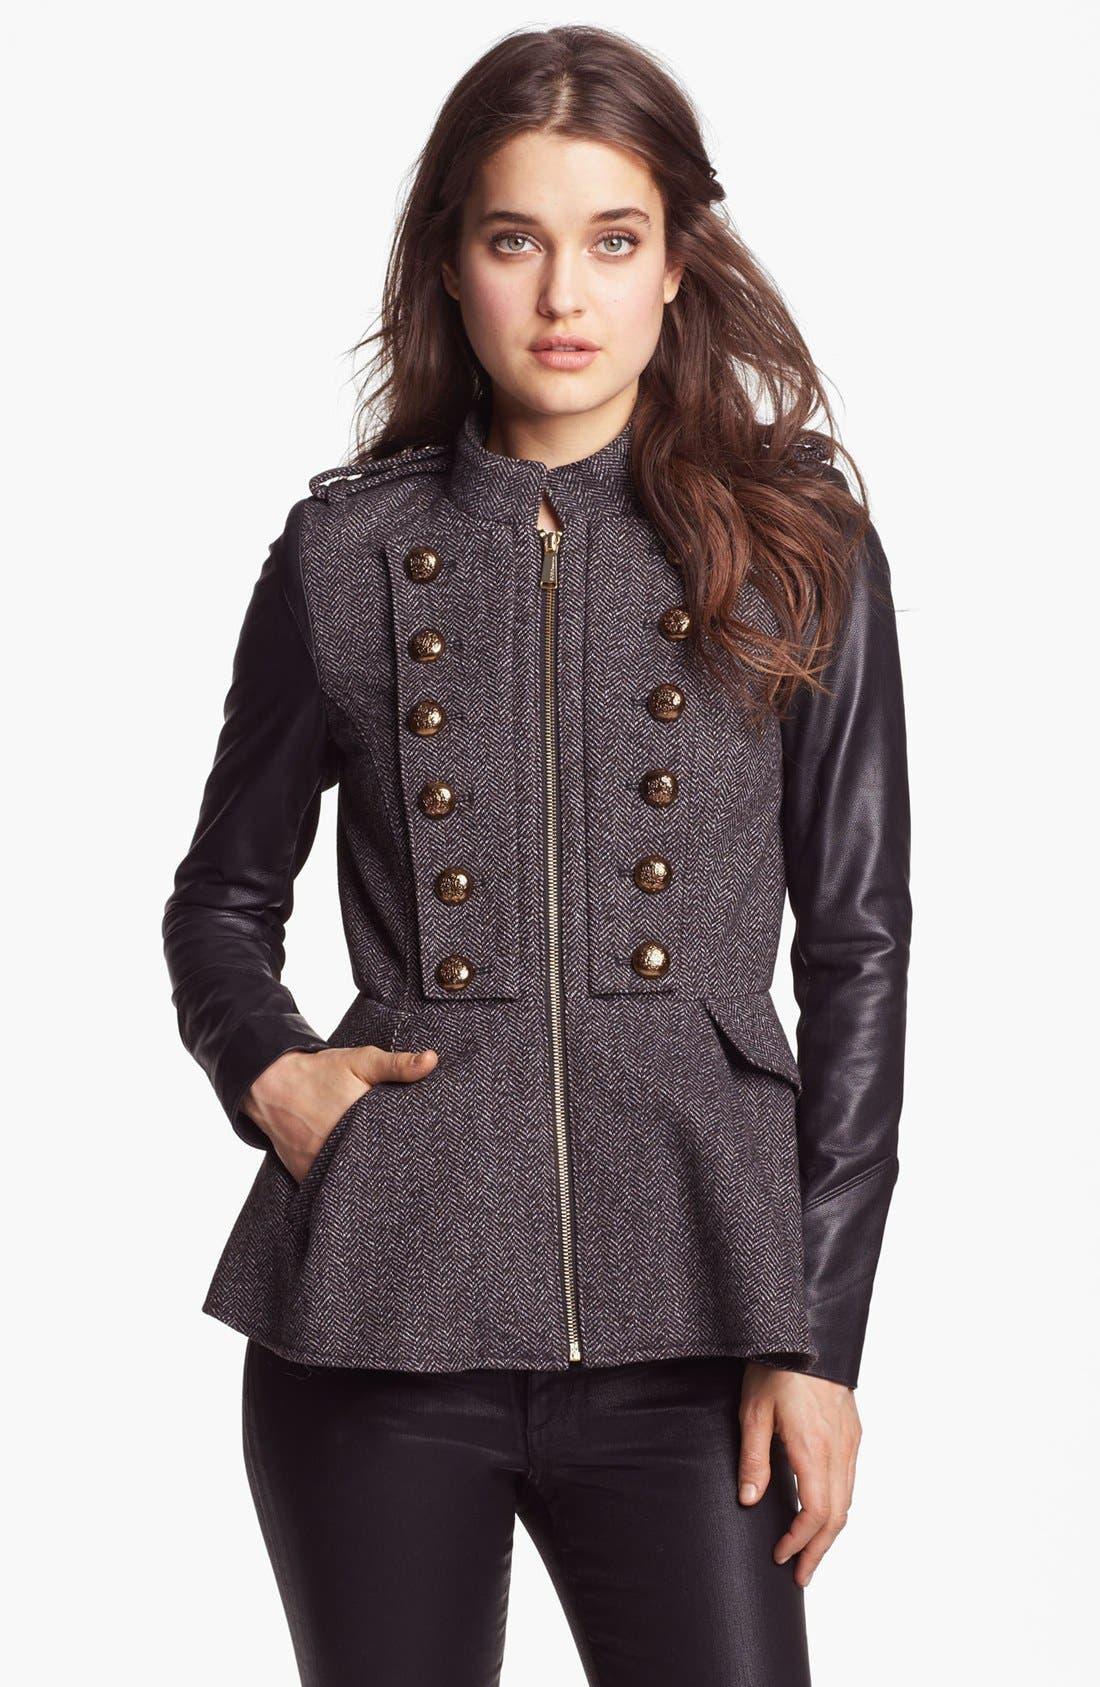 Alternate Image 1 Selected - BCBGeneration Tweed & Faux Leather Military Jacket